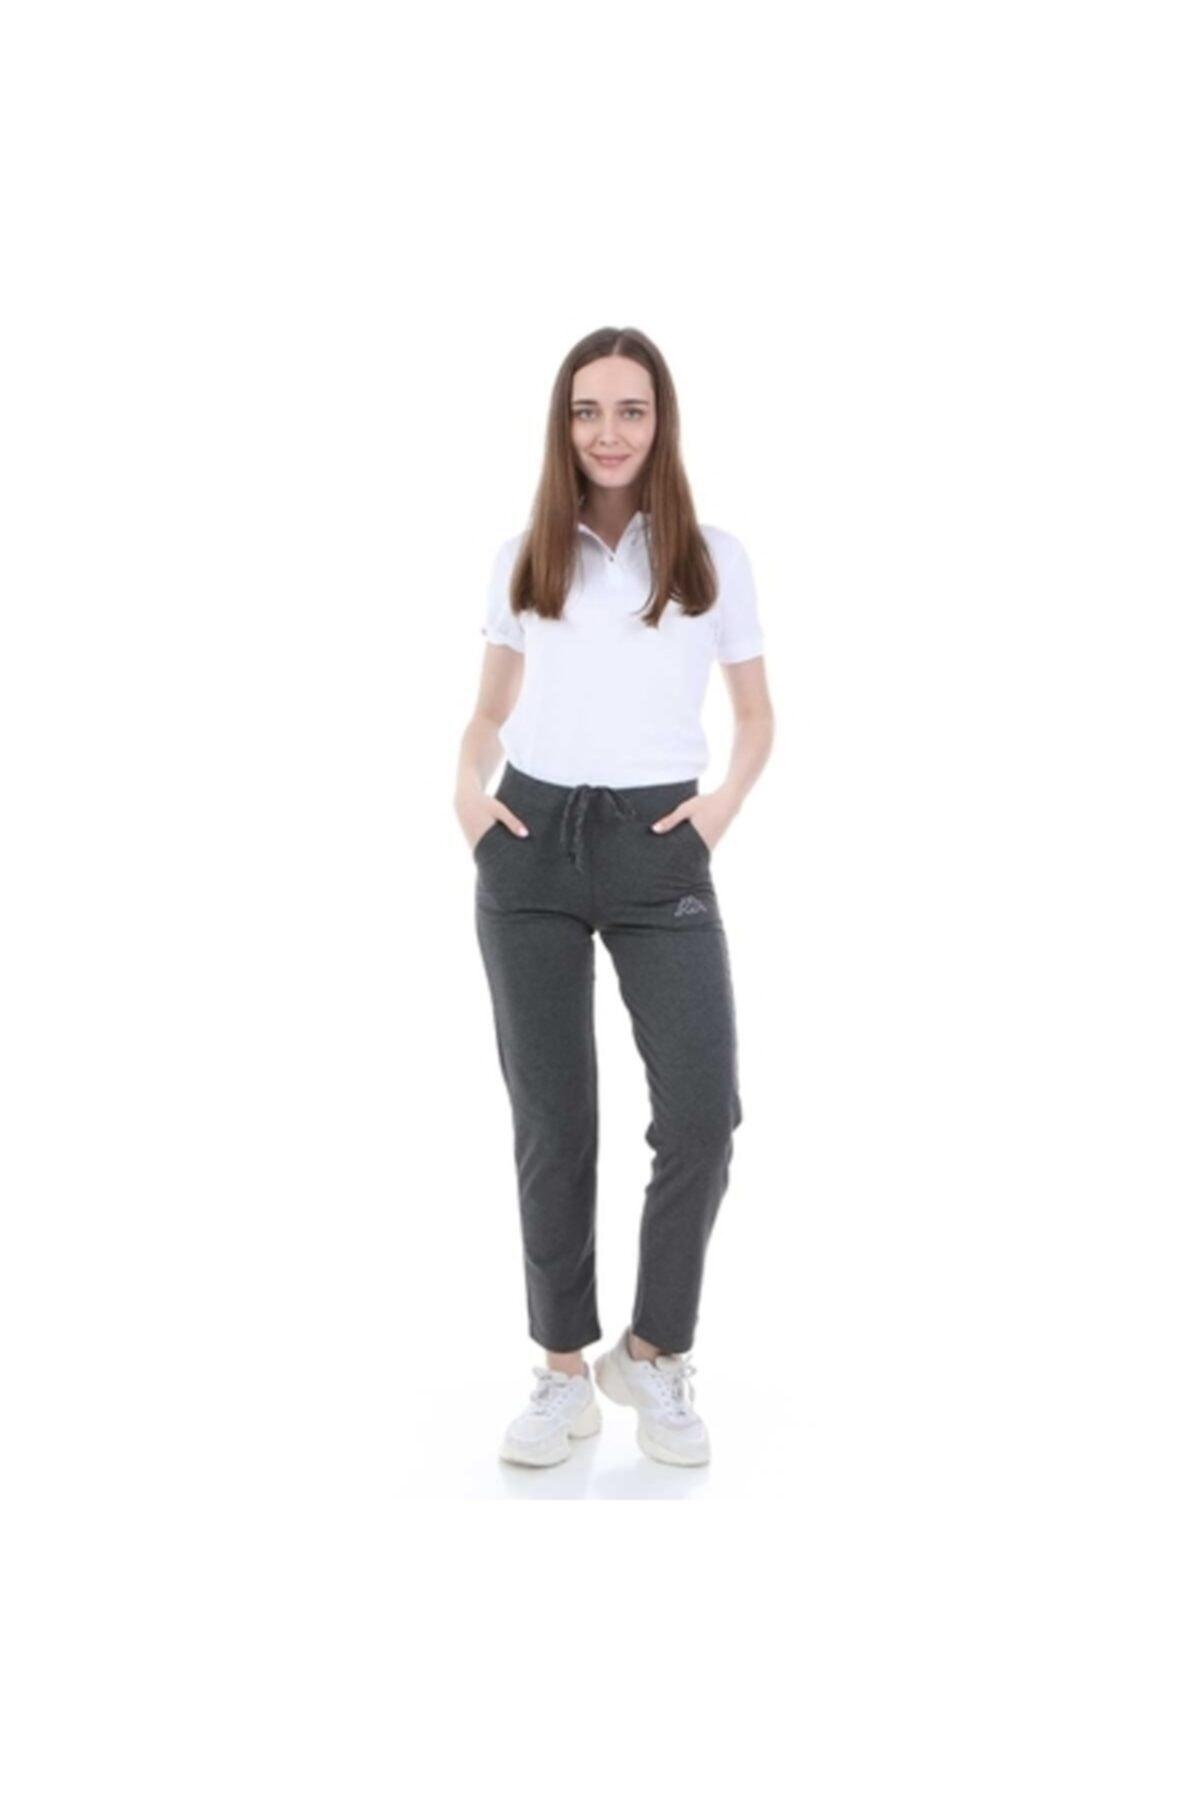 Kappa 30327k0 Kadın Sweat Pantolon Zeny - Füme - Xl 1